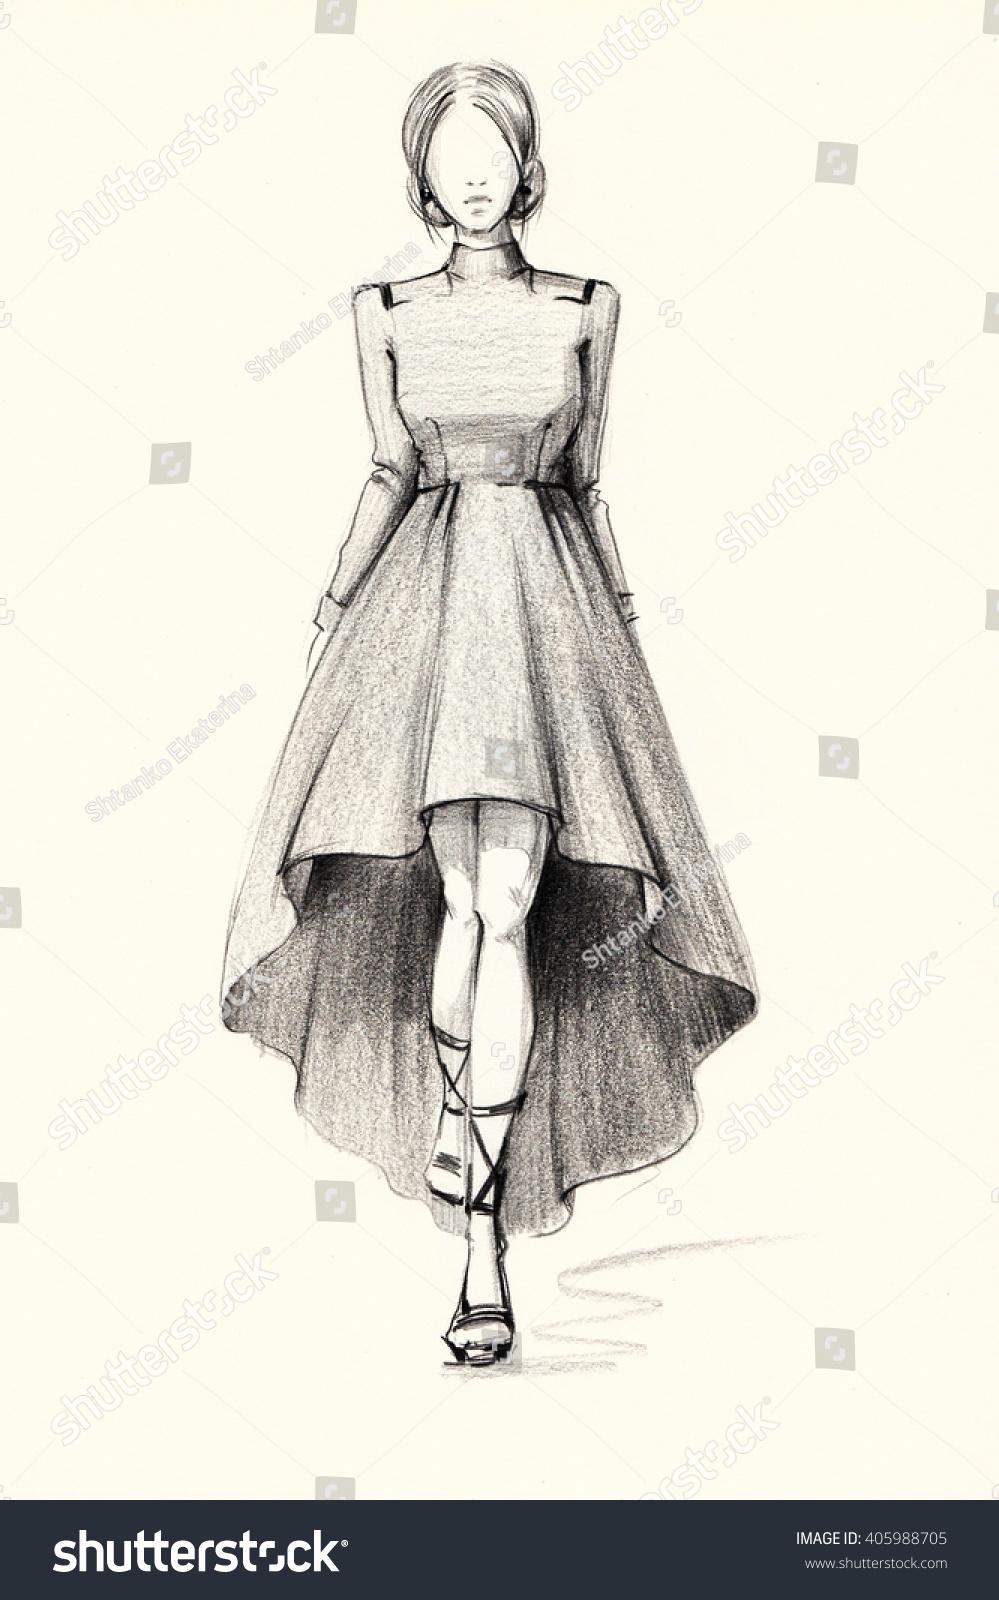 Fashion illustration of a stylish image sketch dress pencil drawing graphic arts